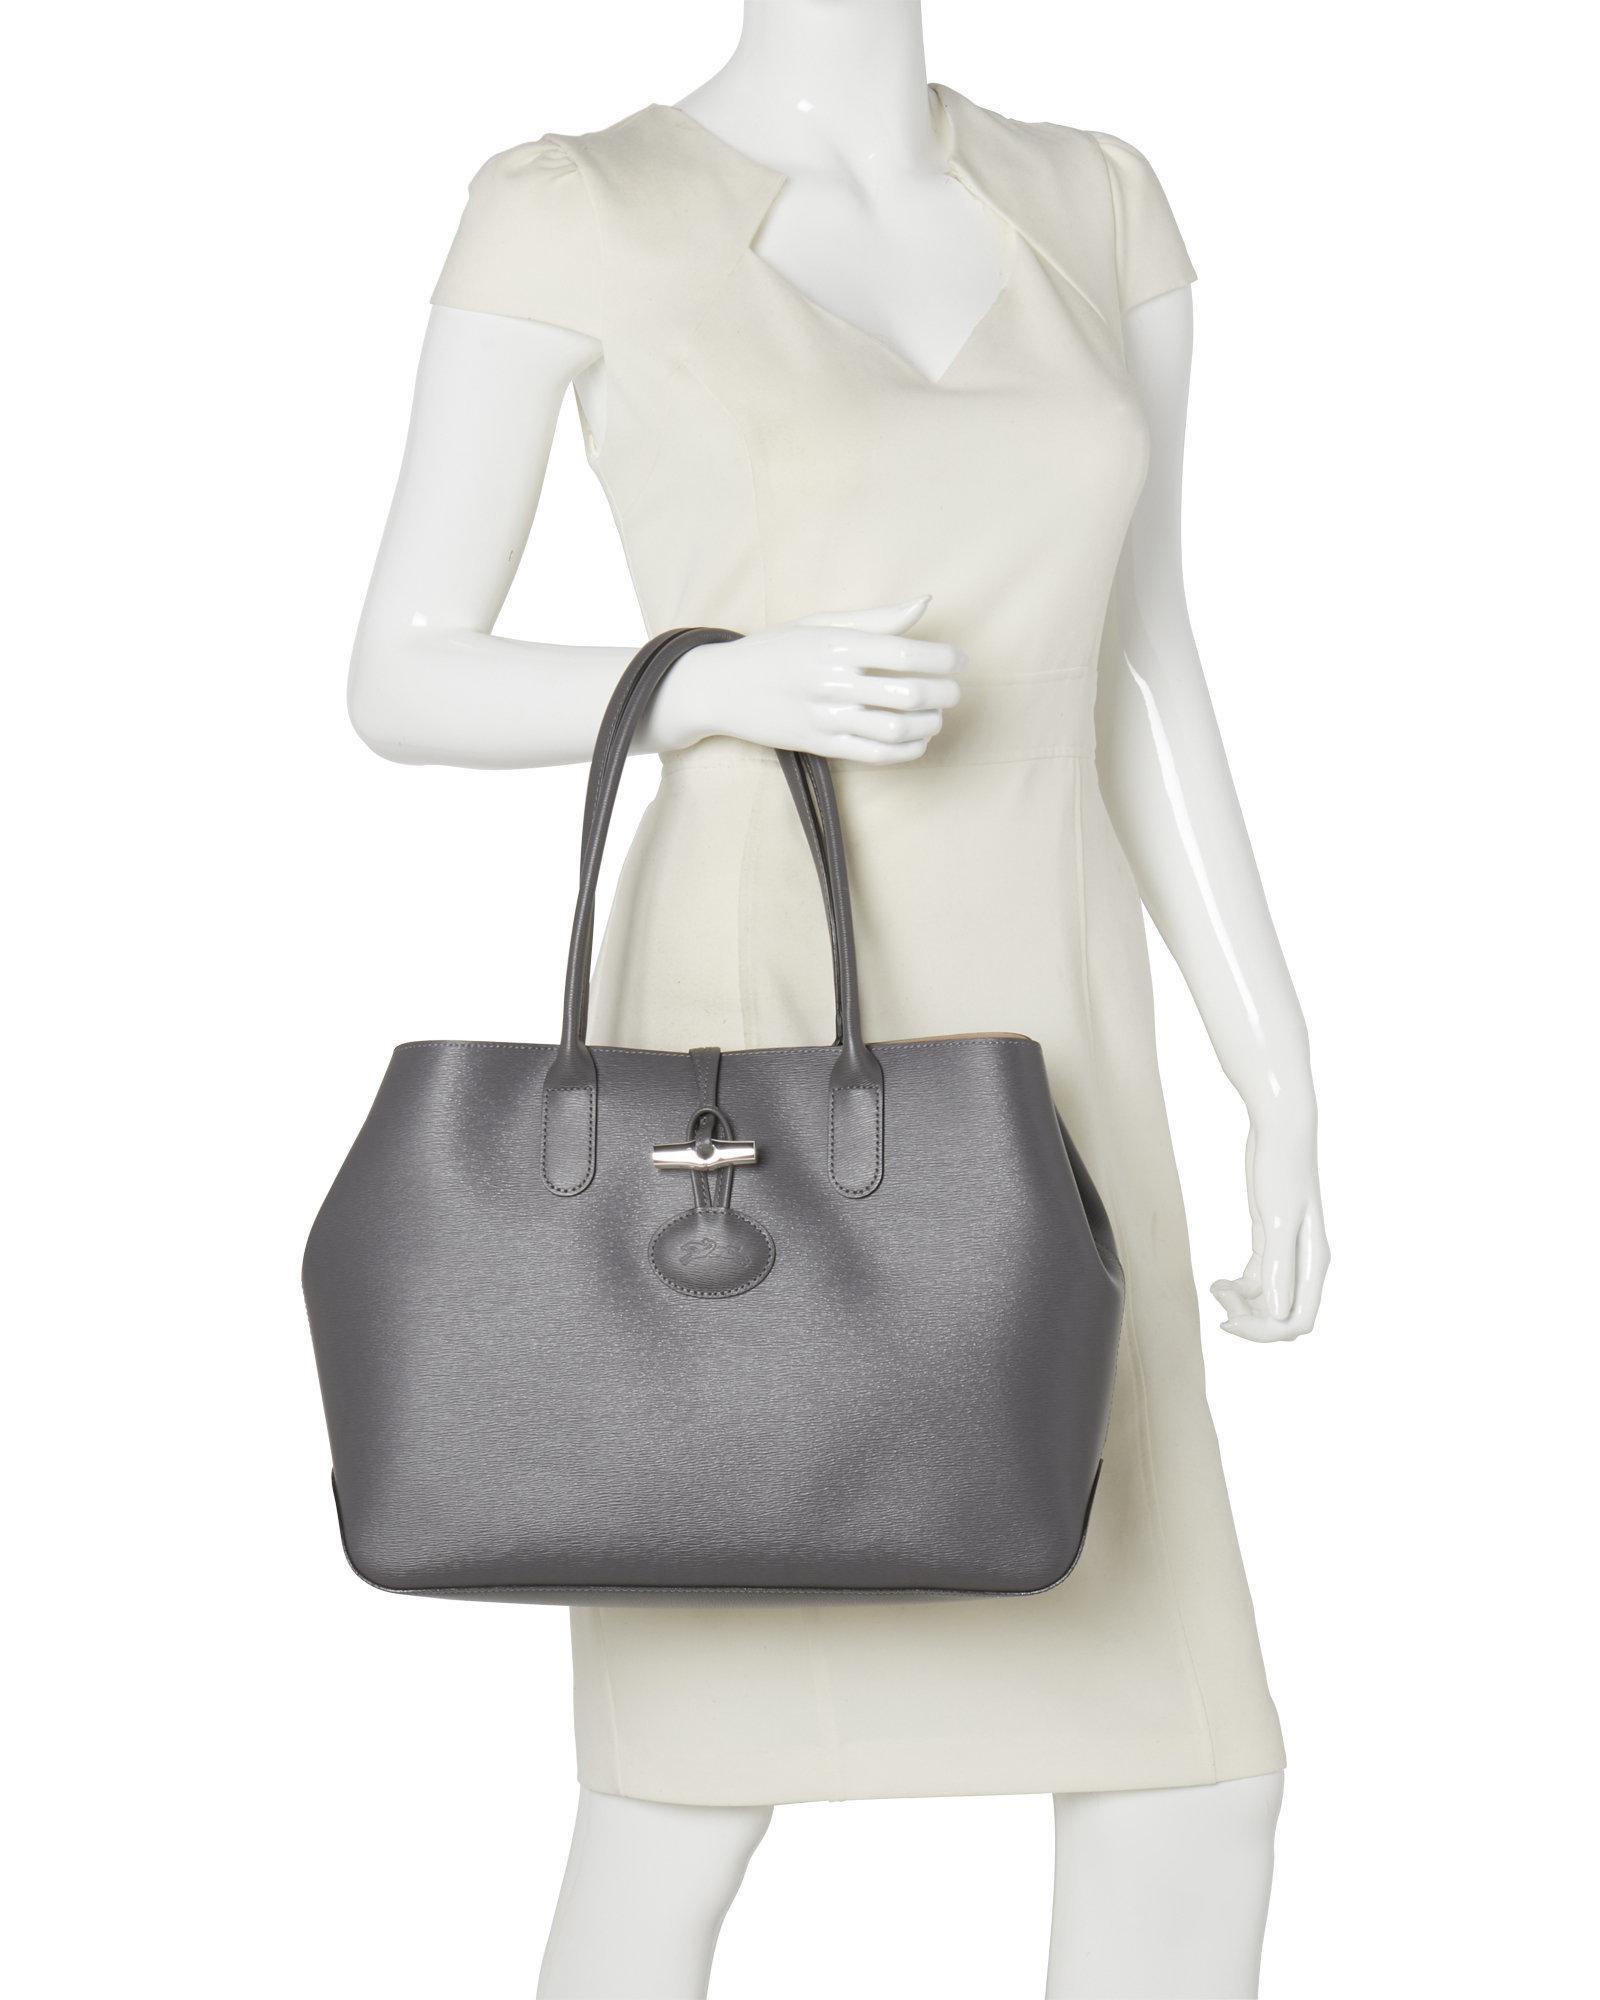 e898c3896c64 Lyst - Longchamp Roseau Grey Shoulder Bag in Gray